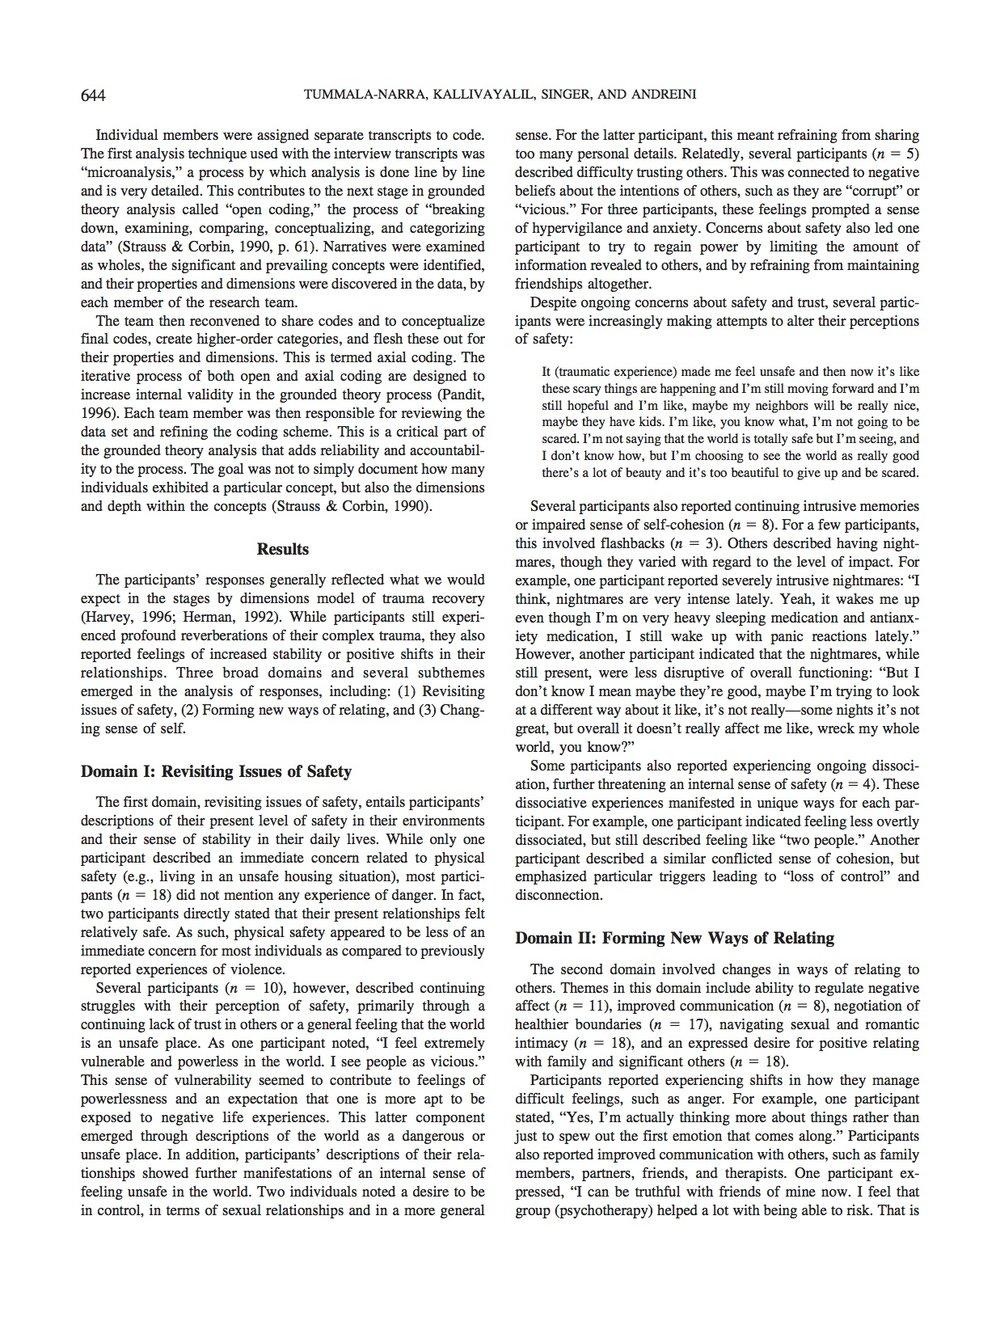 paper p5.jpg